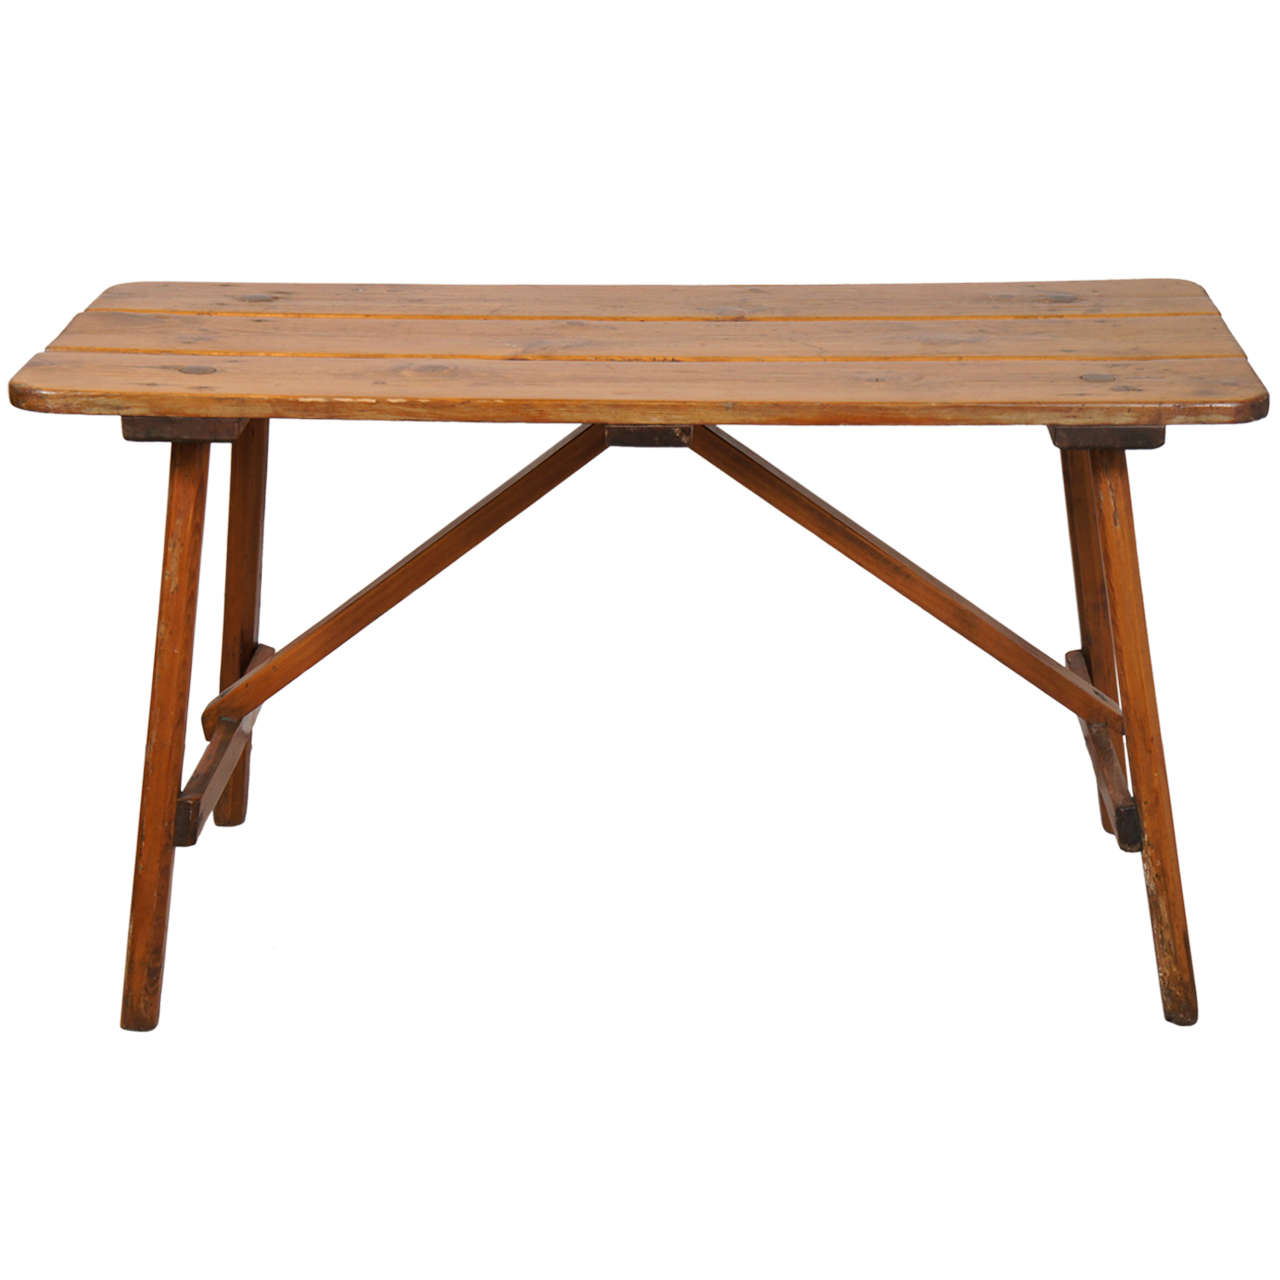 Adirondack Coffee Table Set: 1940s Adirondack Occasional Or Coffee Table At 1stdibs